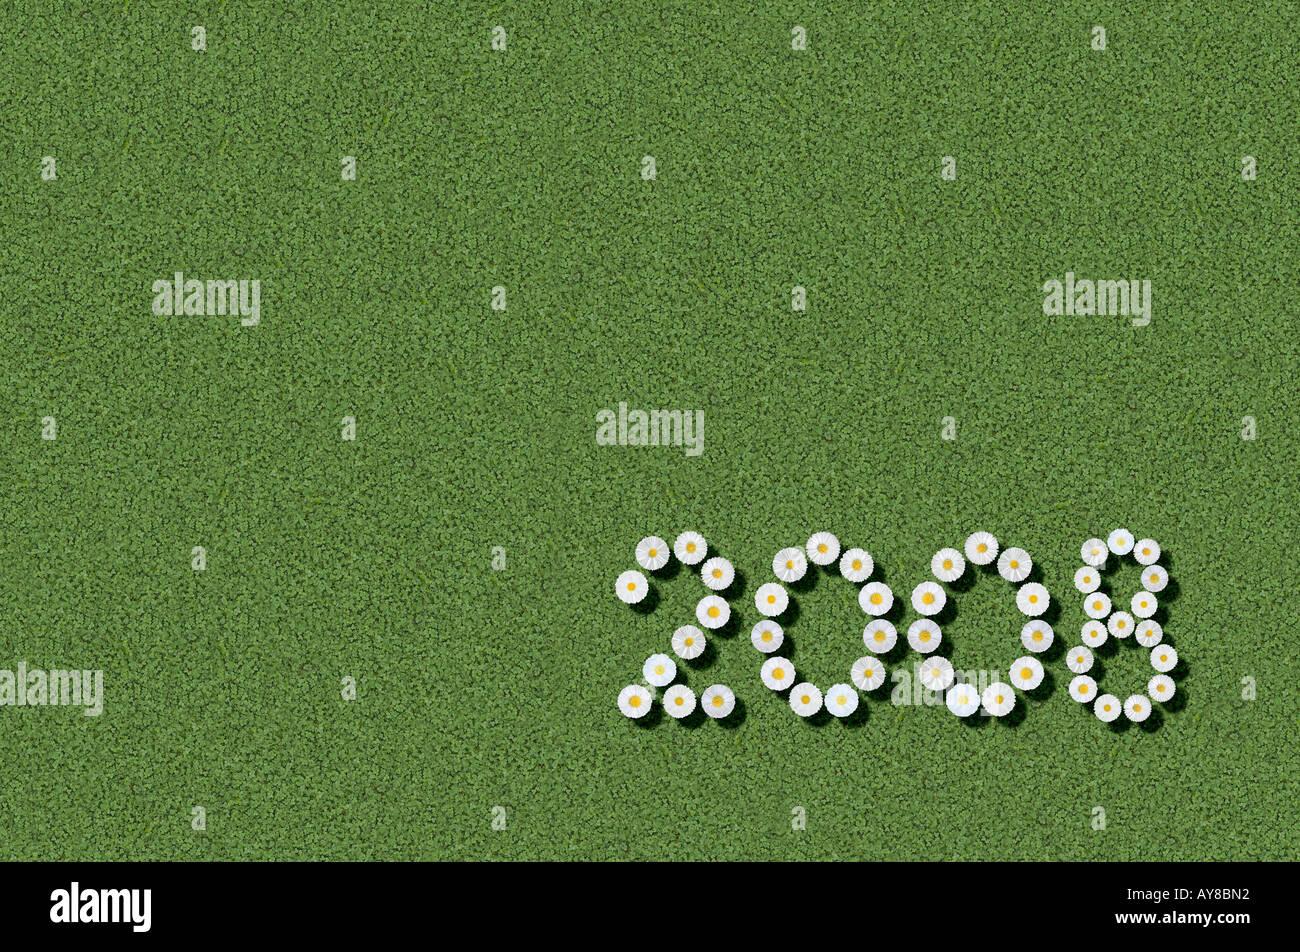 Jahr 2008 Stockbild